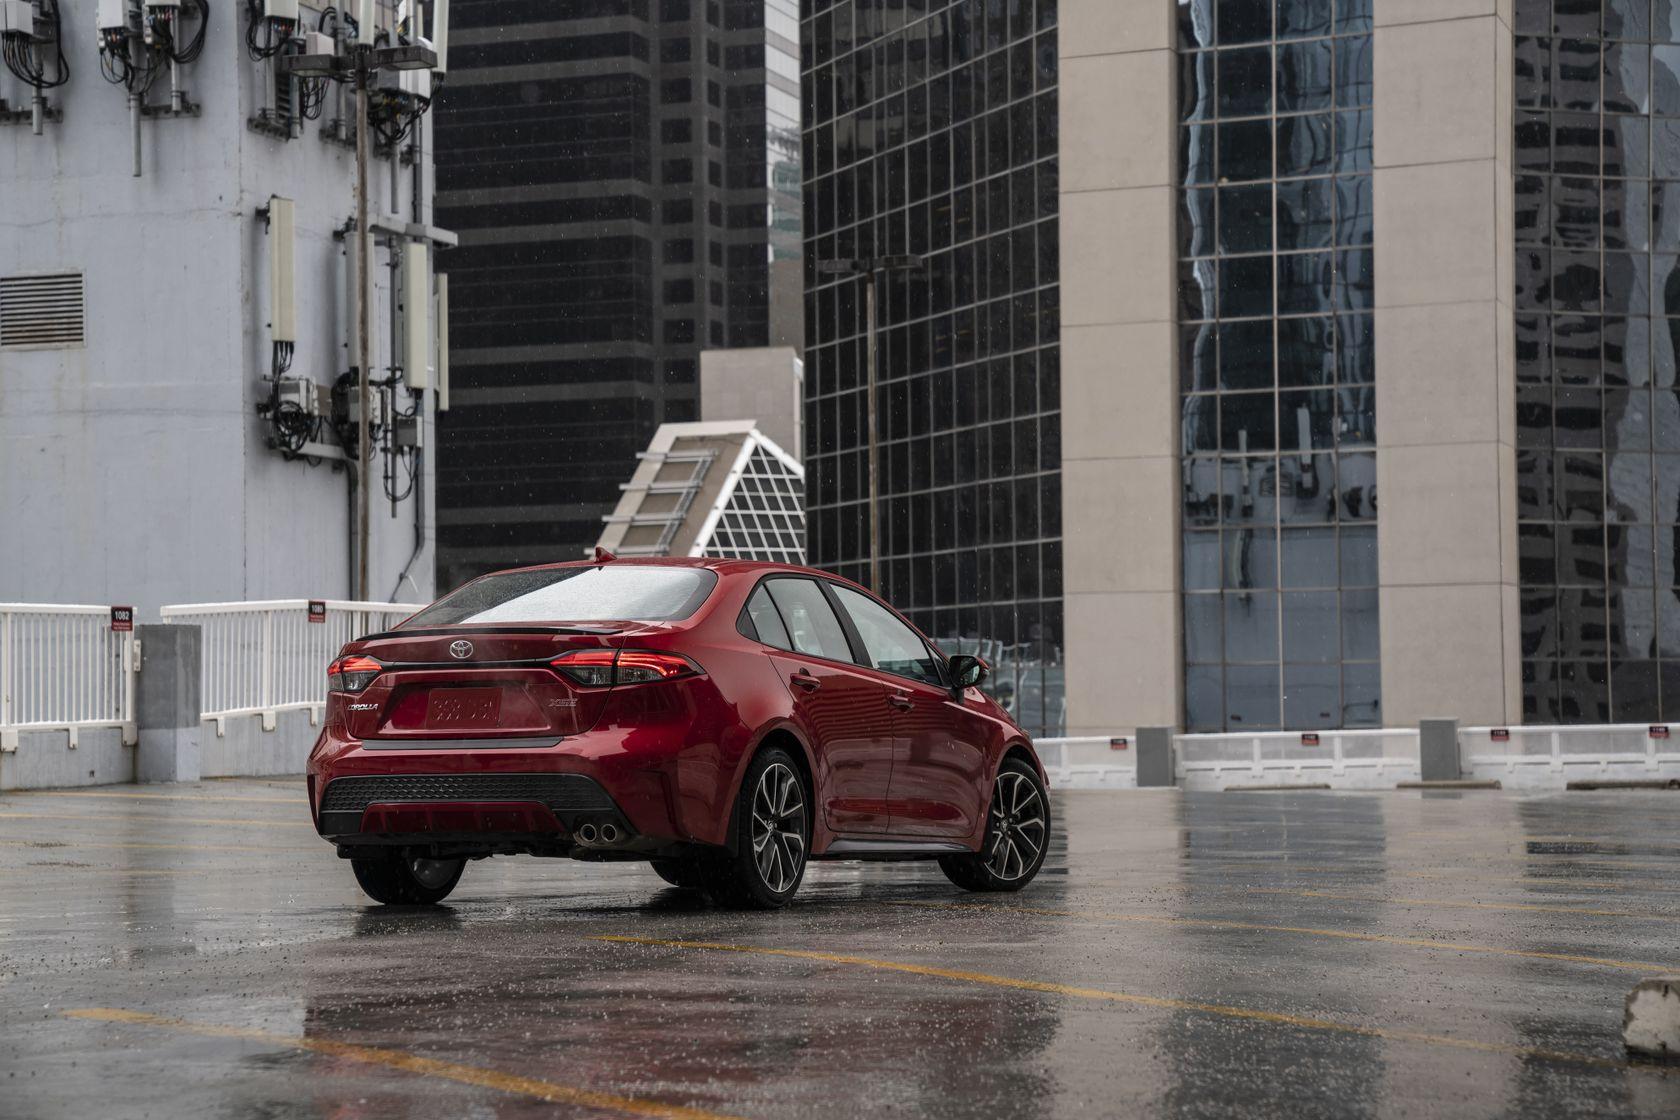 Arrière de la Toyota Corolla 2020 rouge